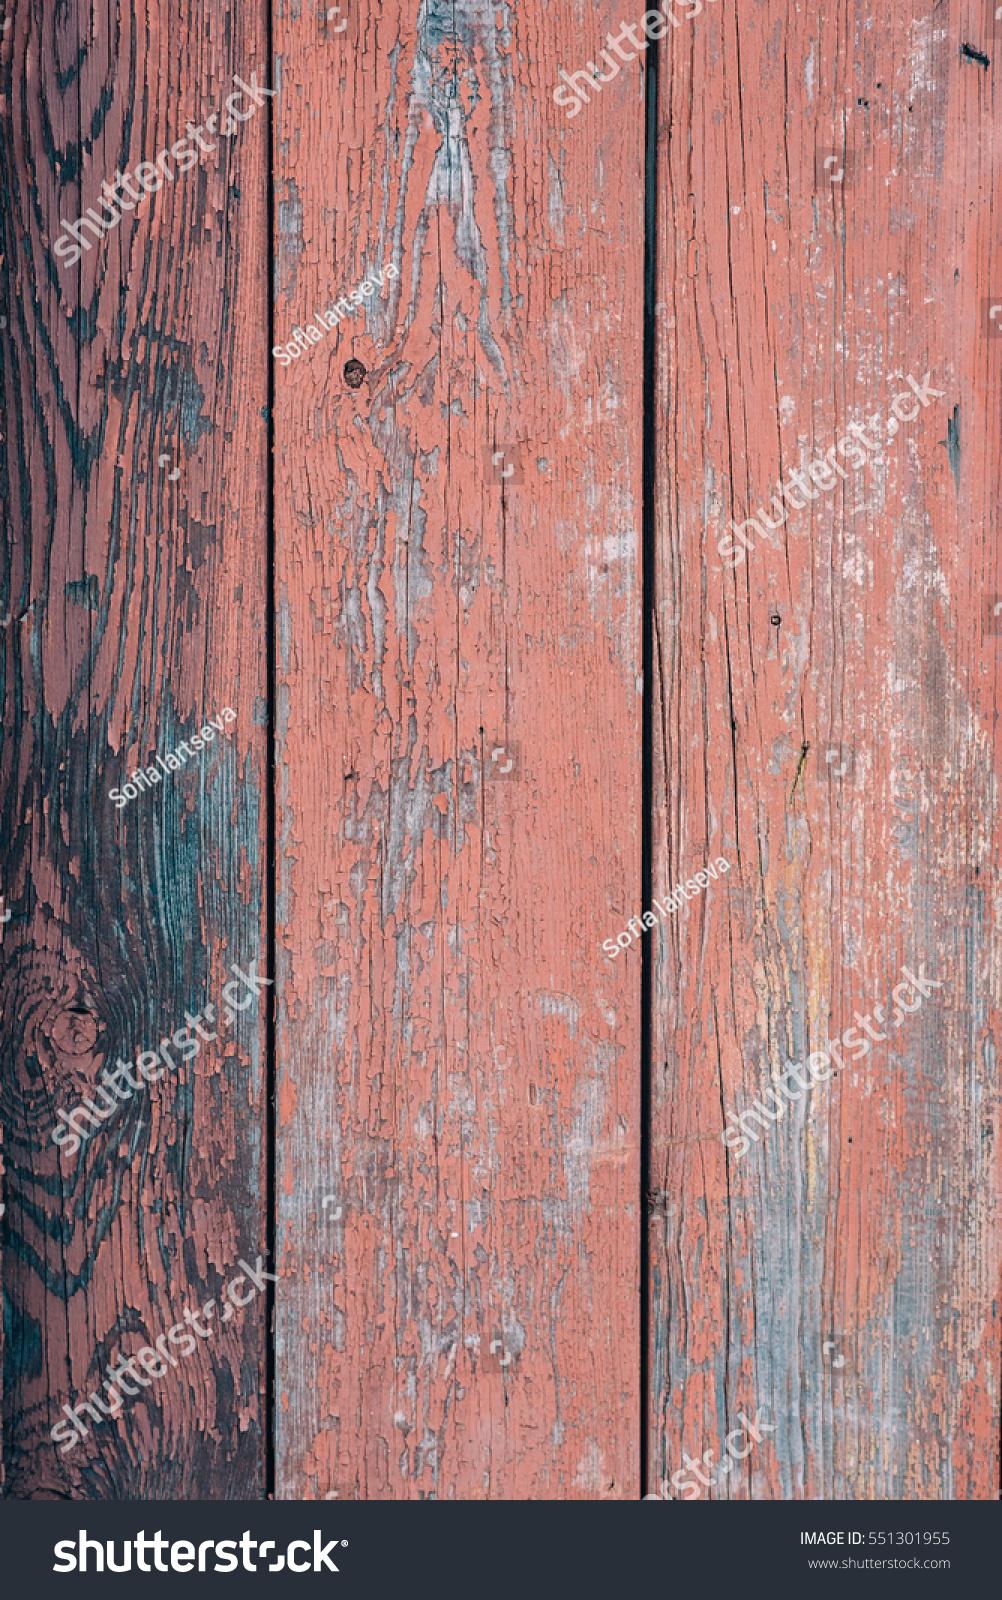 Texture Old Shabby Wooden Planks Peeling Stock Photo 551301955 Shutterstock